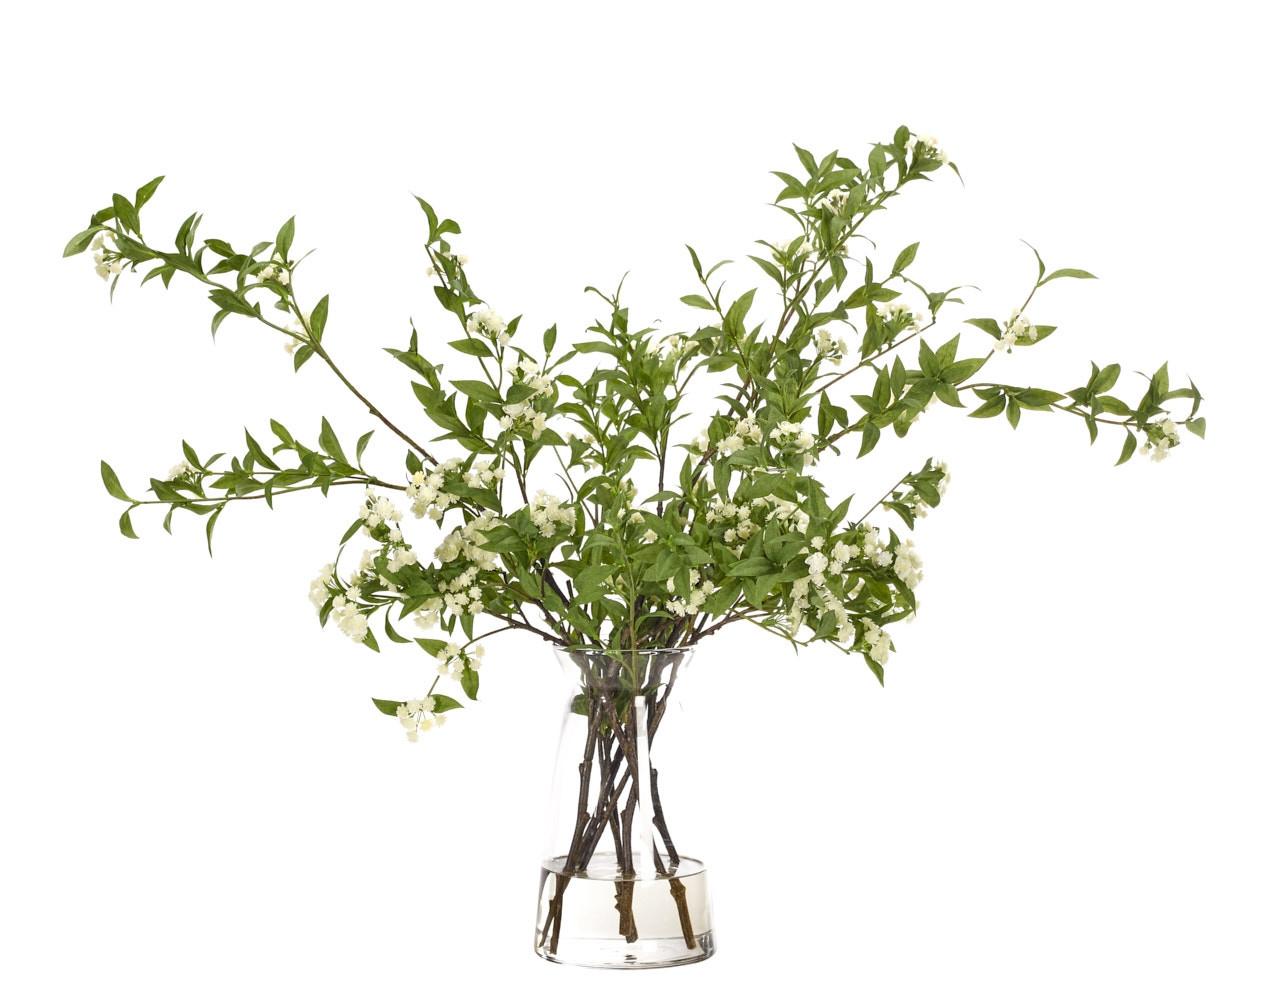 15 Elegant Very Large Glass Vase 2021 free download very large glass vase of spiraea branch white cinched glass vase 30wx20dx24h inside 2cc831191a07aab801eac0ba8b63